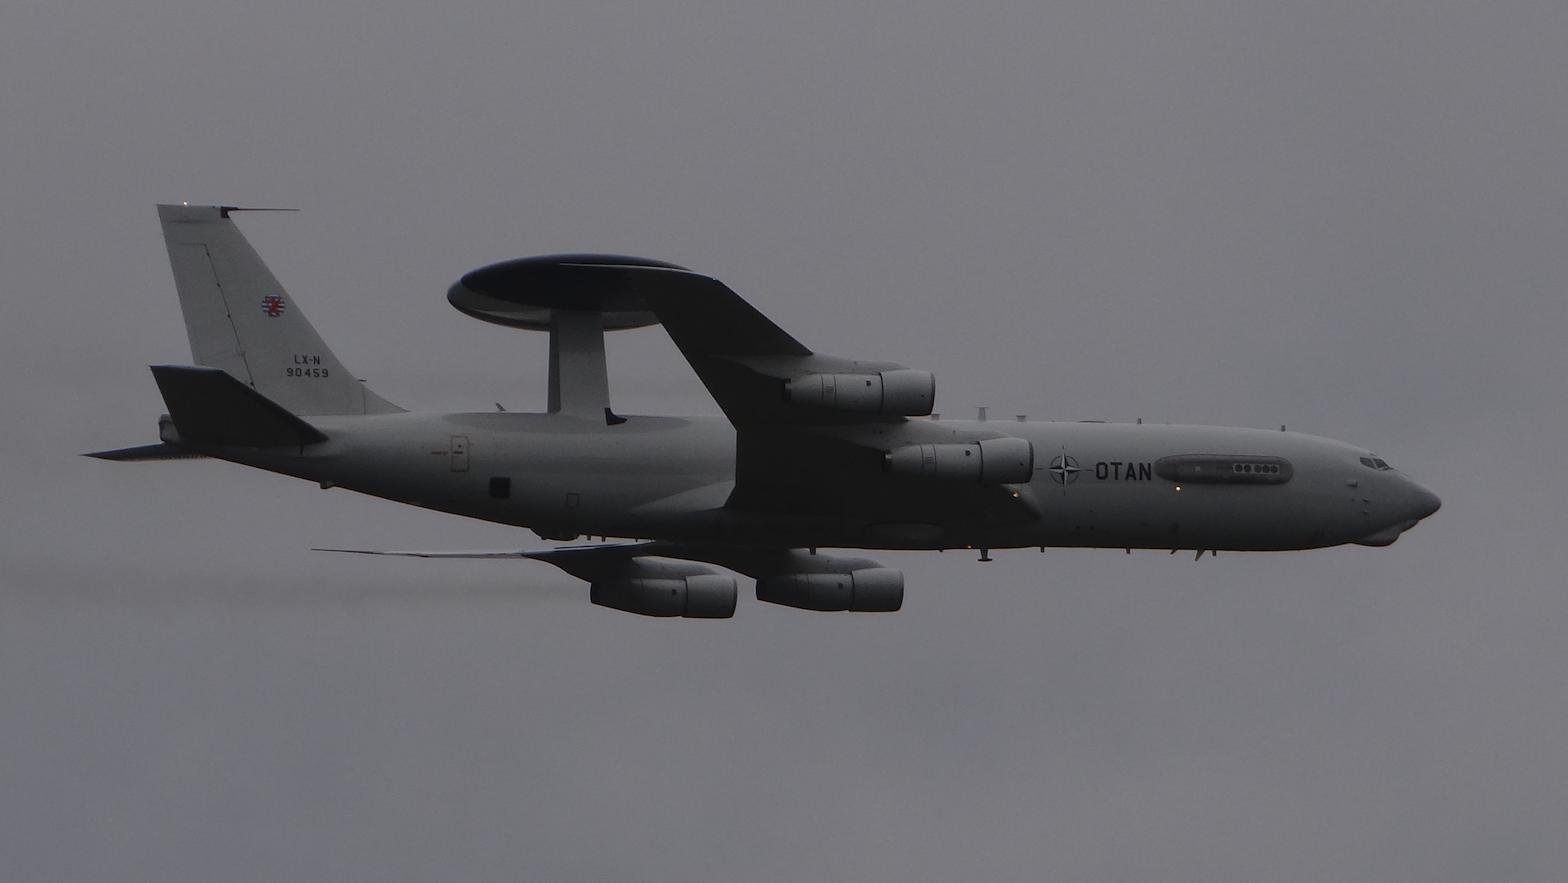 Boeing E-3 Sentry AWACS. 2018 rok. Zdjęcie Karol Placha Hetman